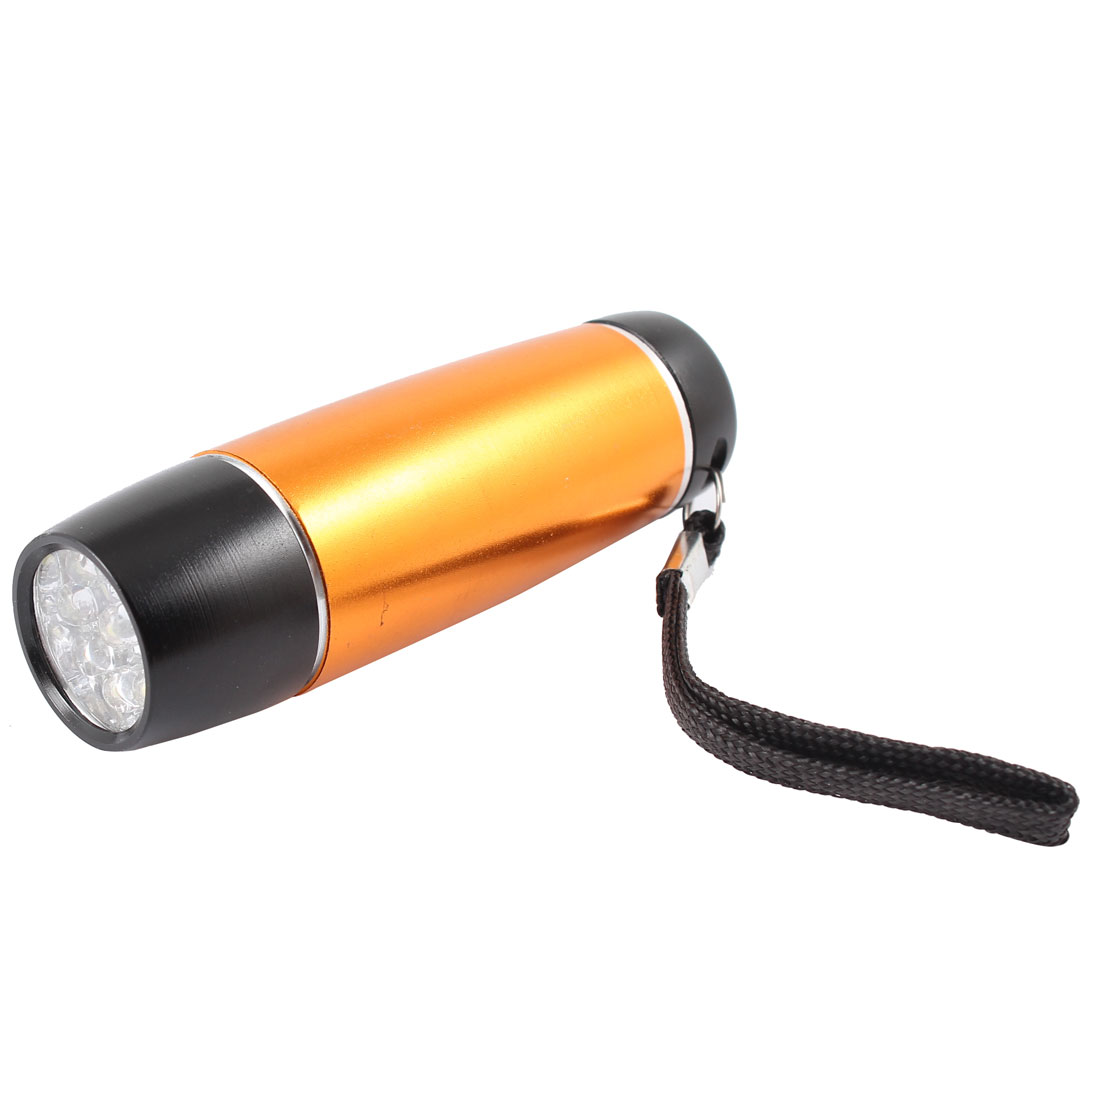 Portable Copper Tone Metal Housing 9 LED Light Bulb Flashlight Torch